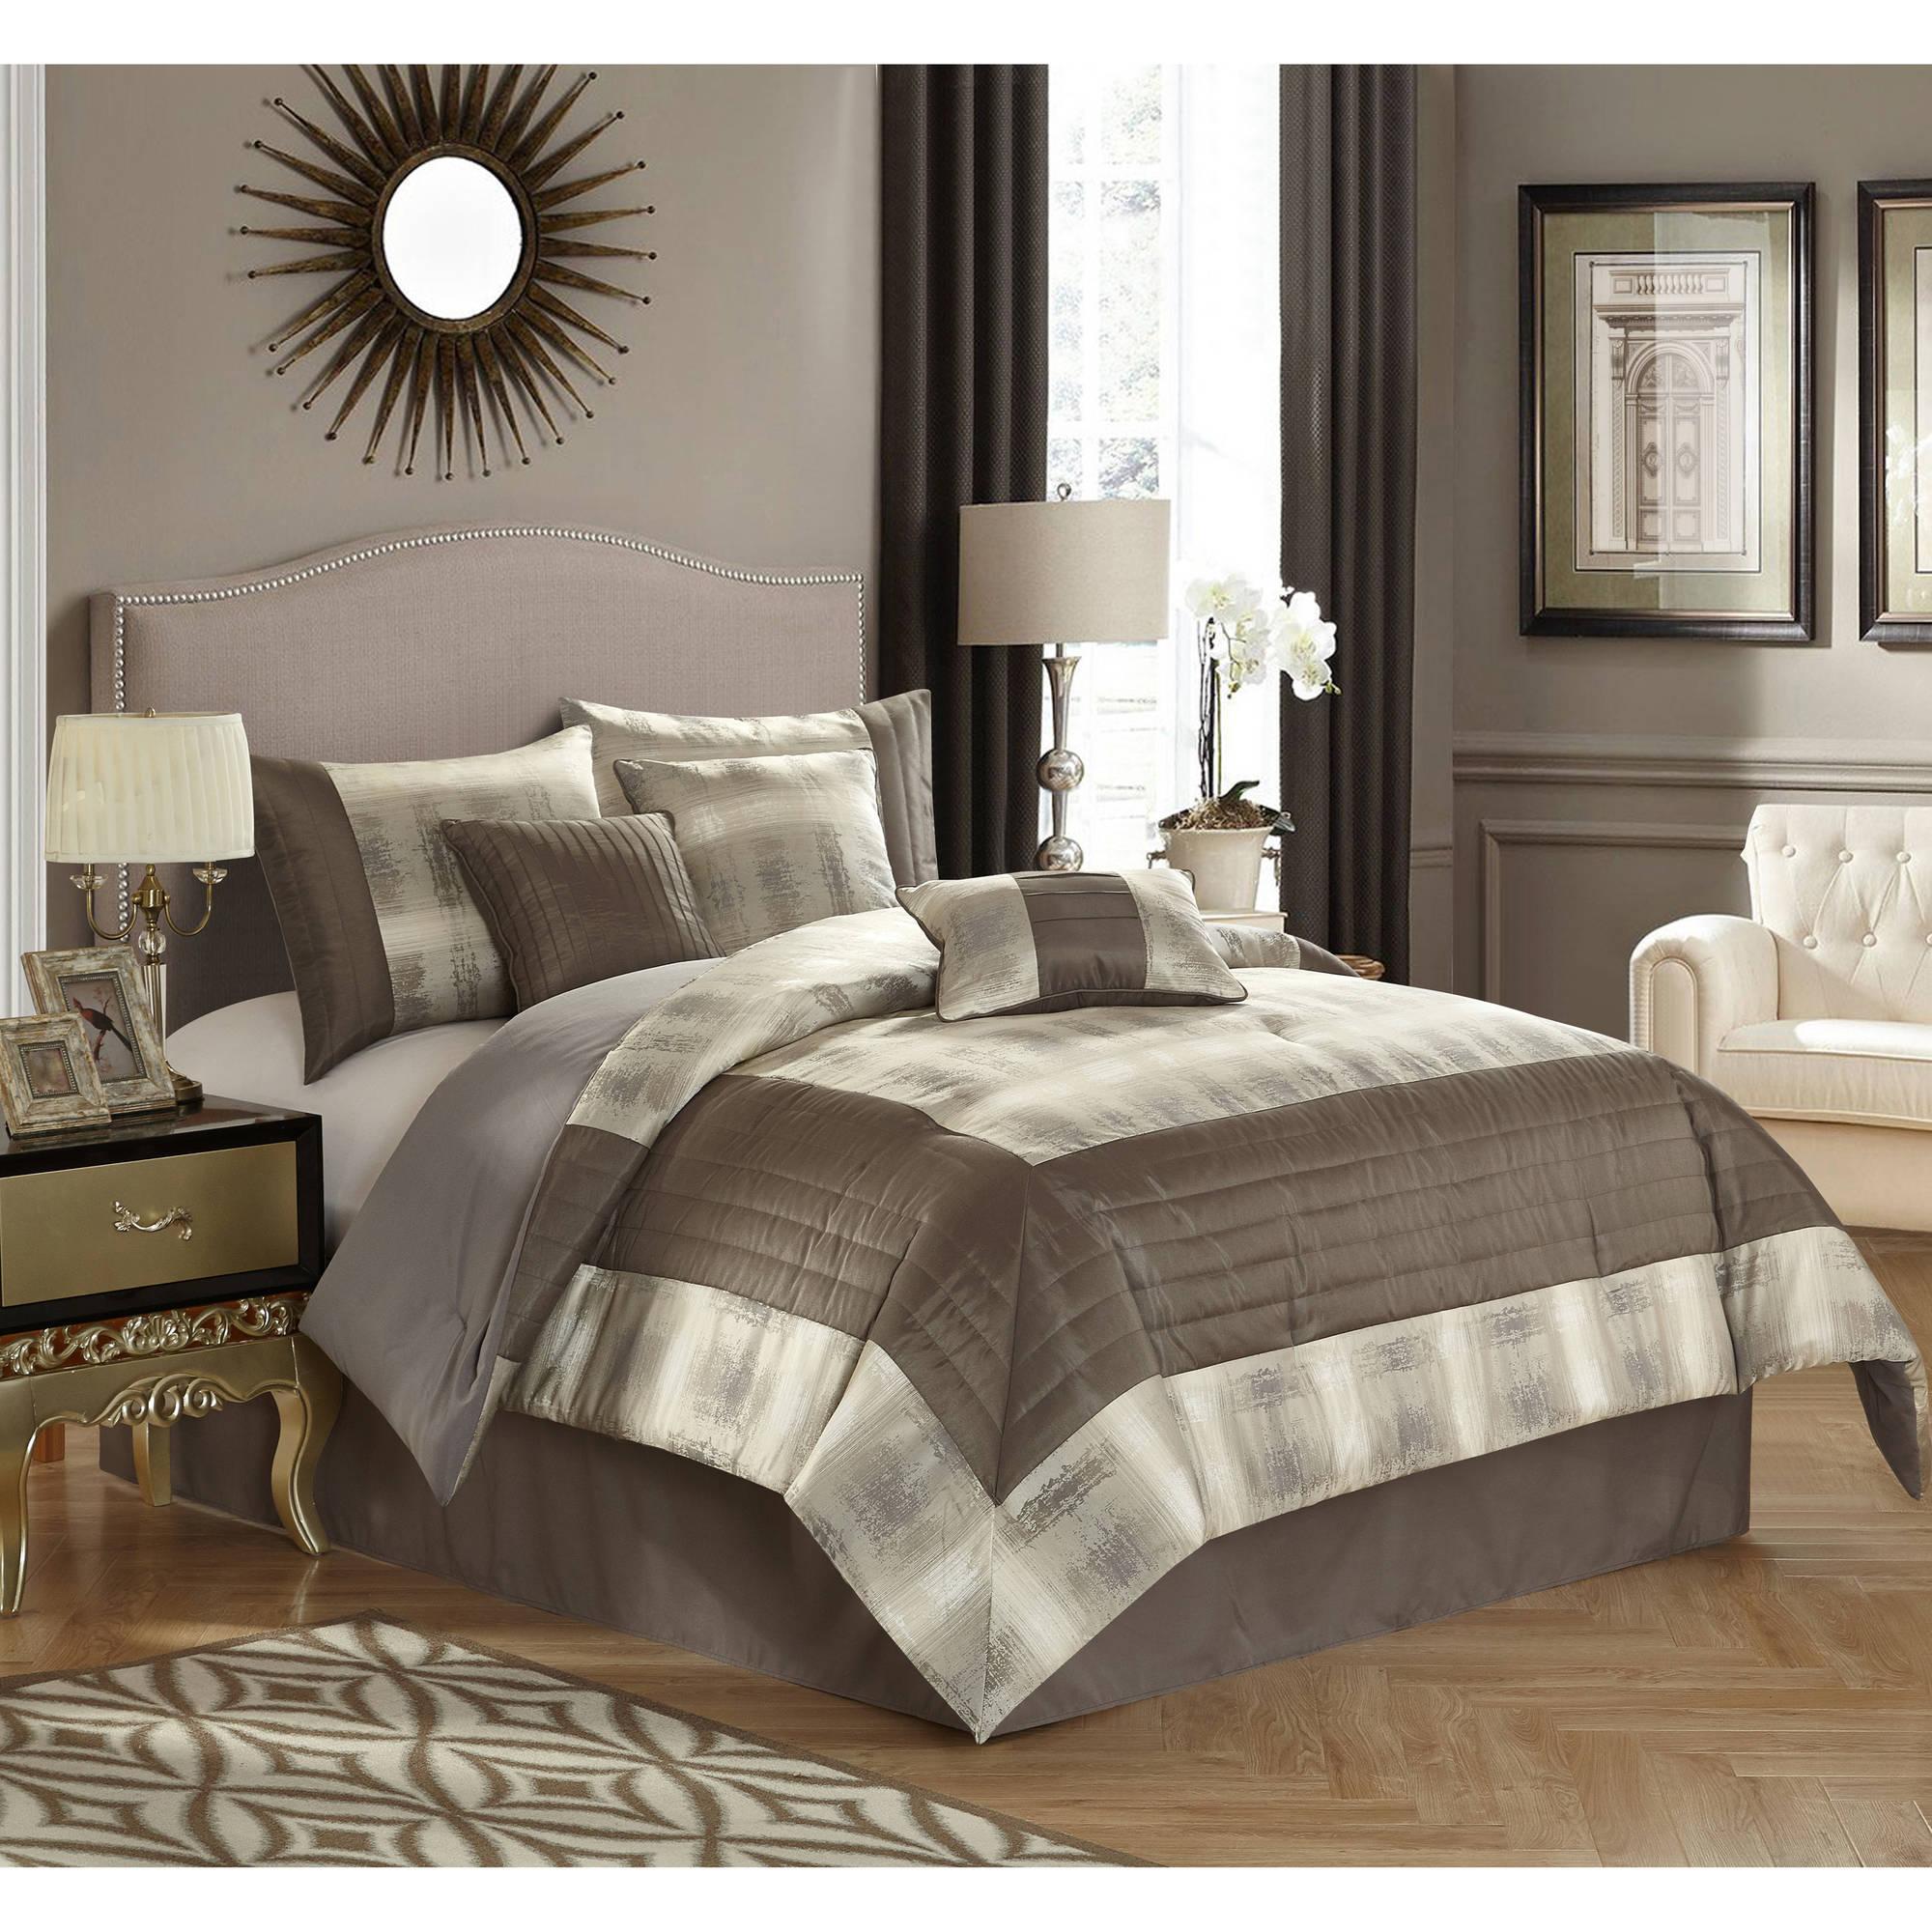 Better Homes and Garden Grey Stripe 7-Piece Bedding Comforter Set